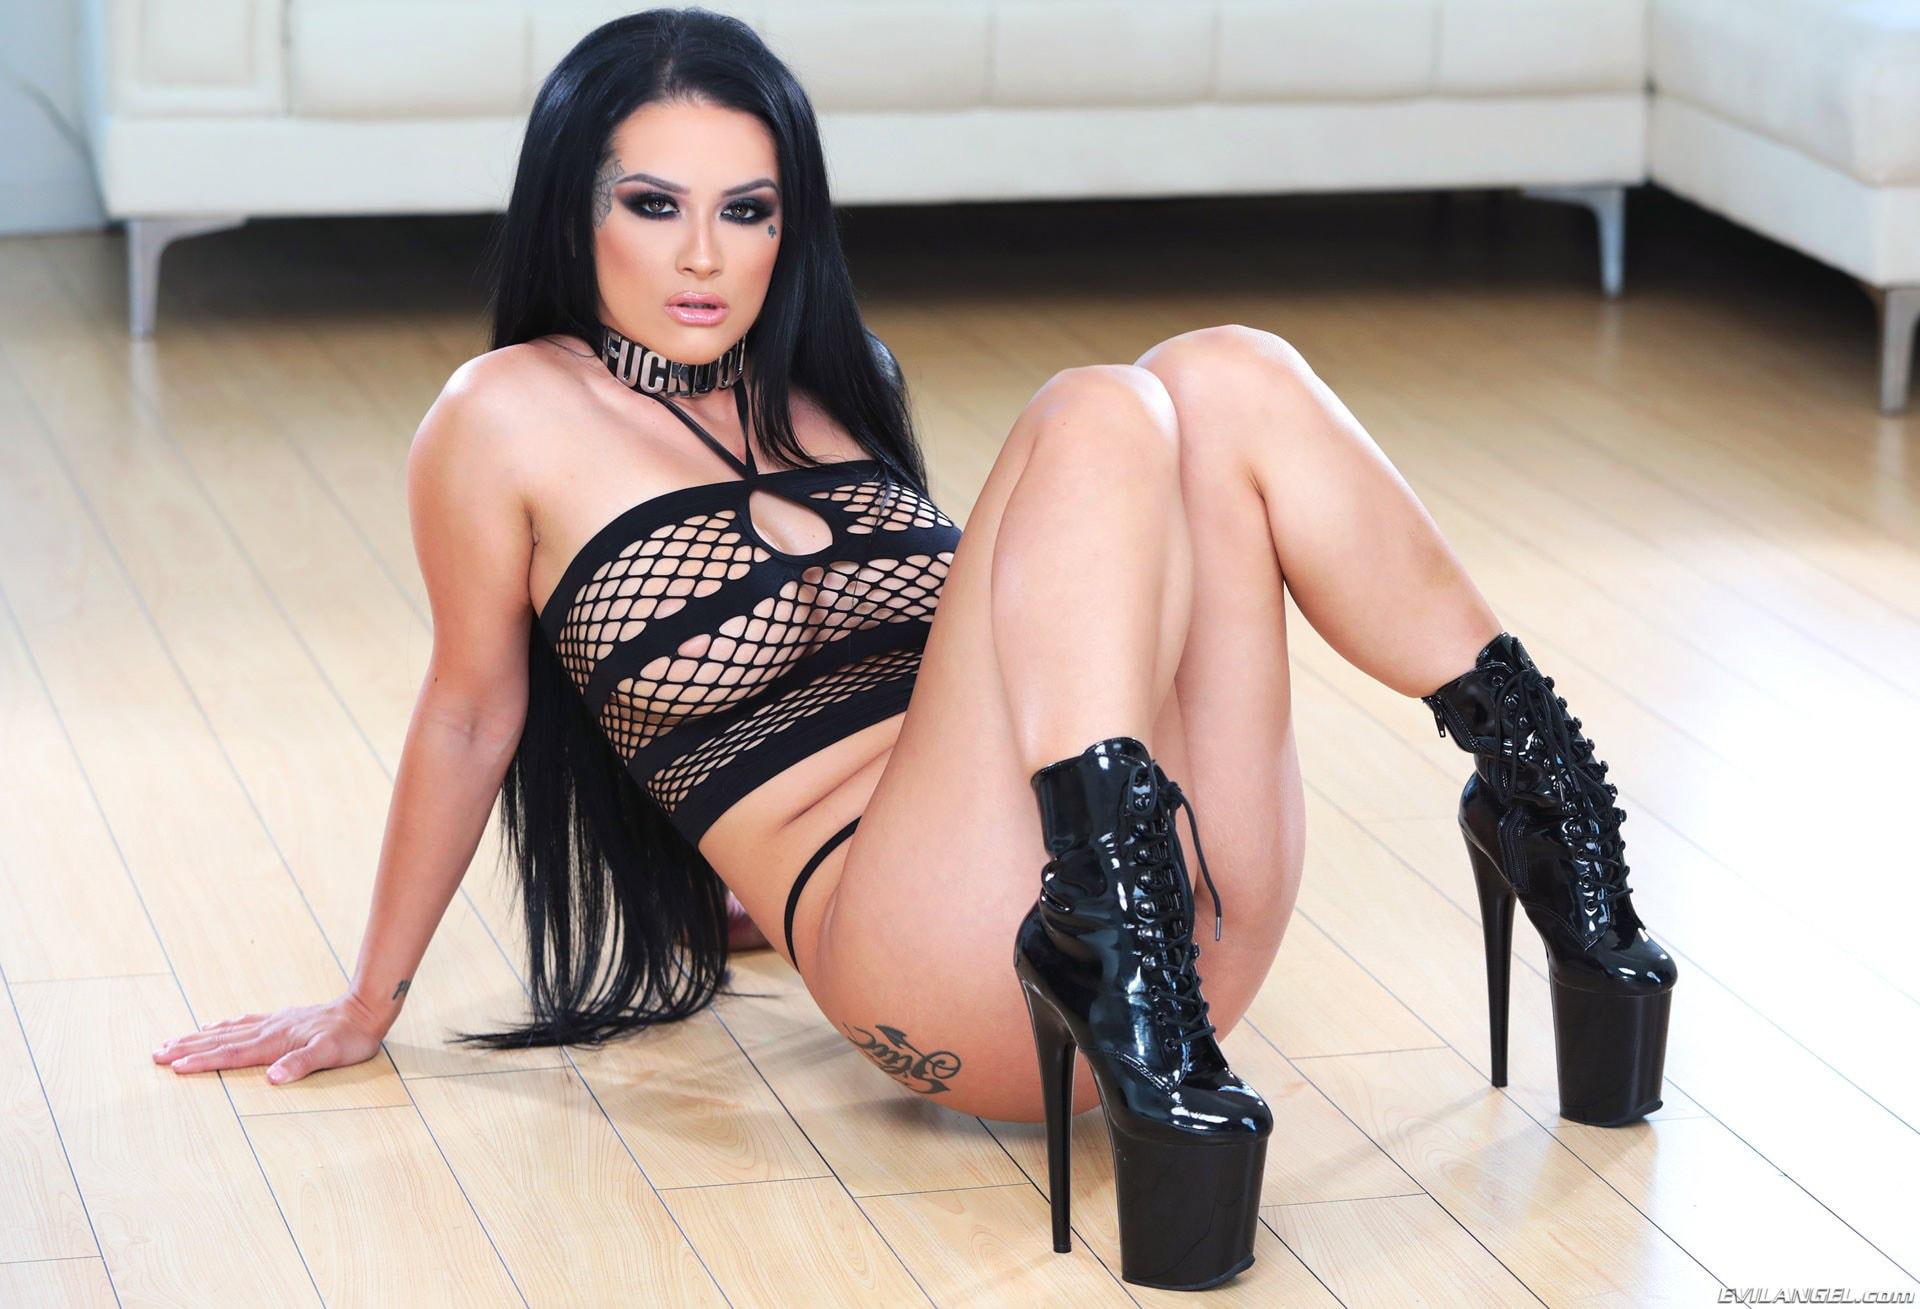 Evil Angel 'Creampie Compilation - Jonni Darkko' starring Britney Amber (Photo 84)